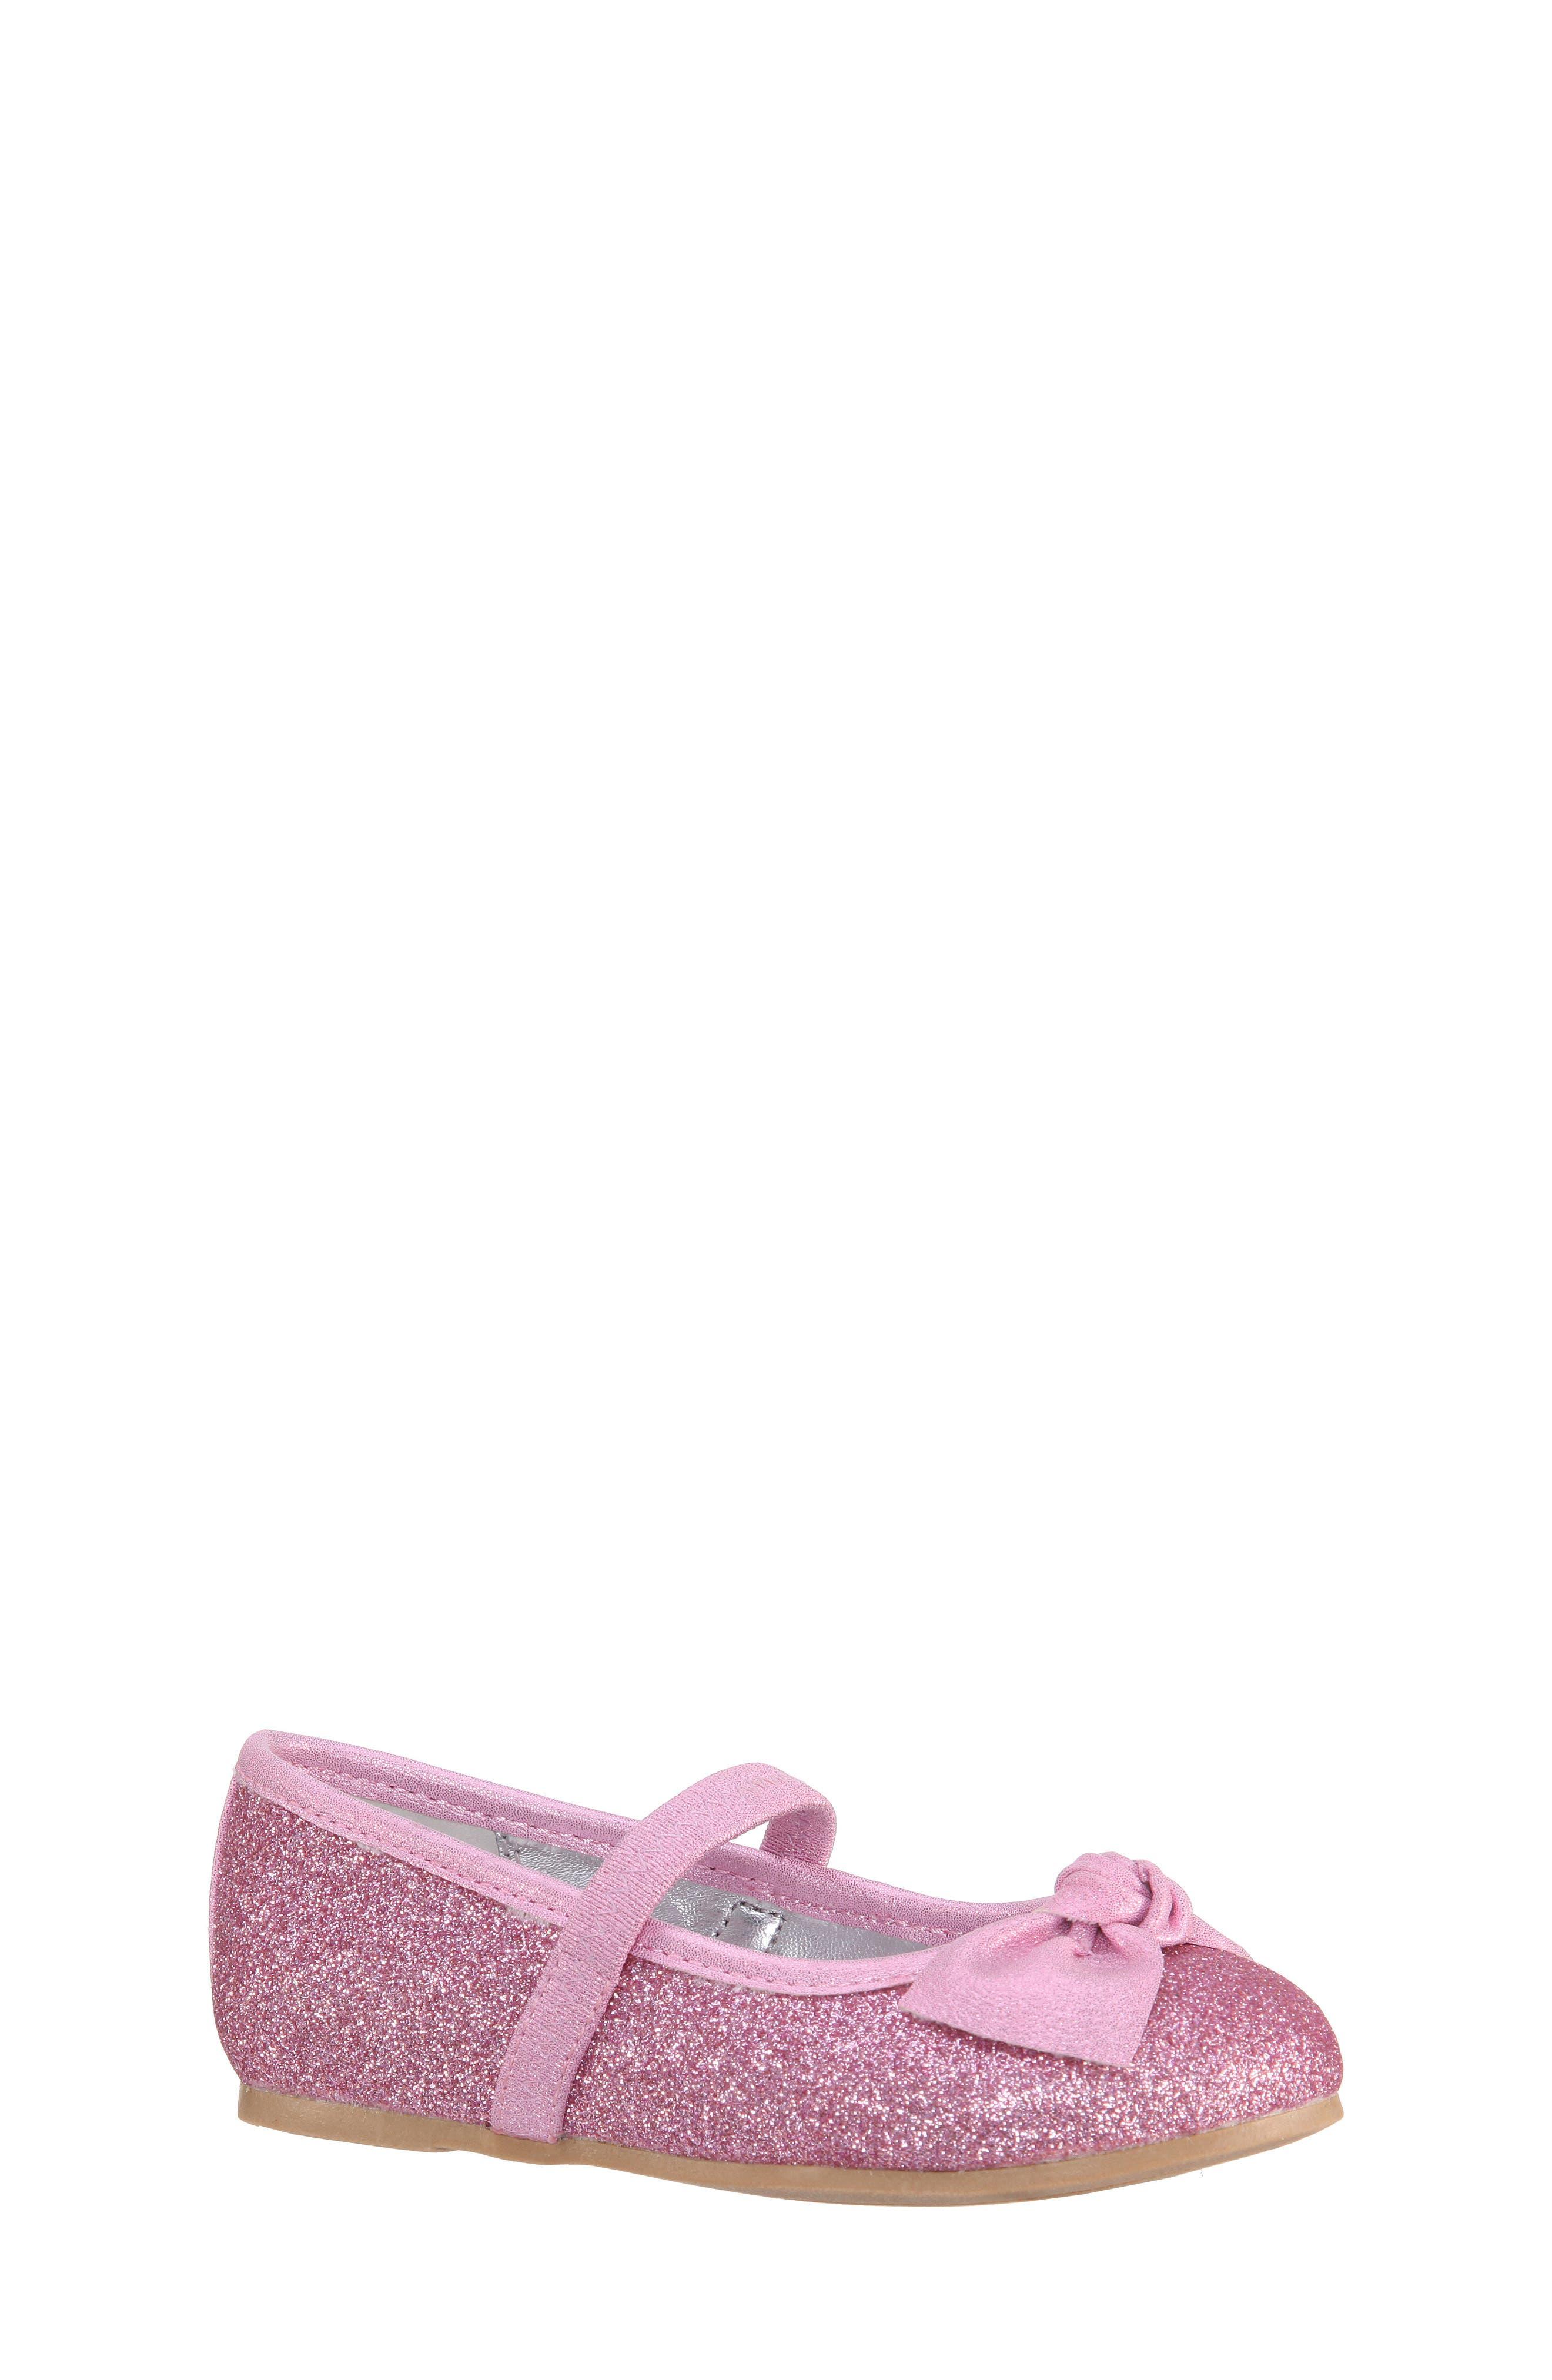 Larabeth-T Glitter Bow Ballet Flat,                             Main thumbnail 1, color,                             Light Pink Metallic/ Glitter